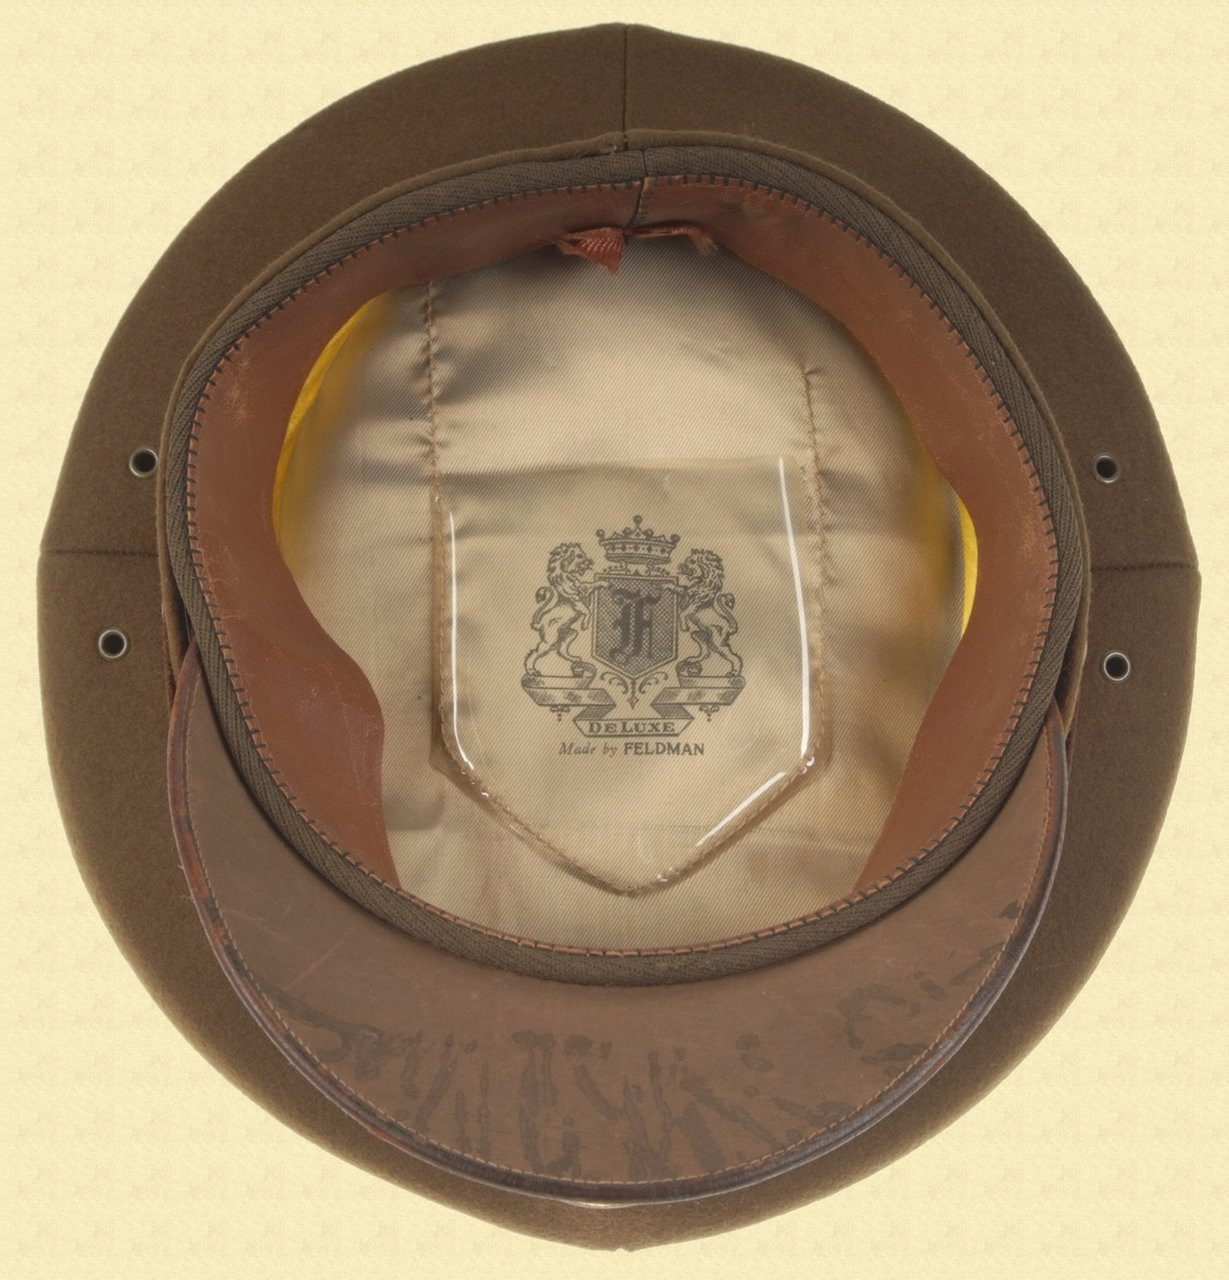 US WW2 VISOR HAT - C11573